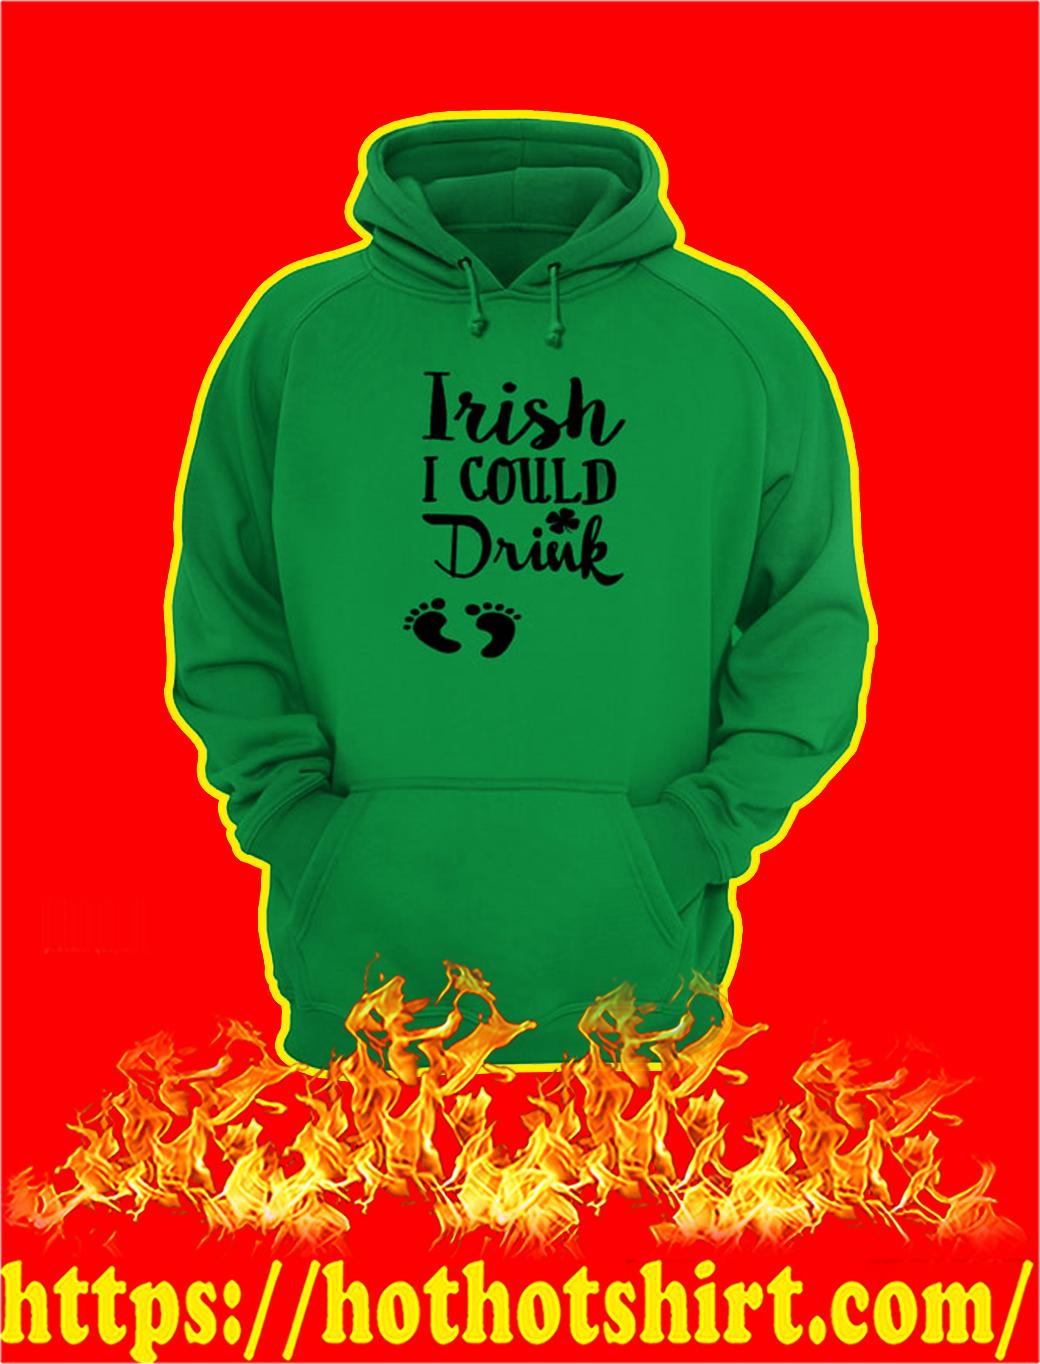 Irish I Could Drink hoodie